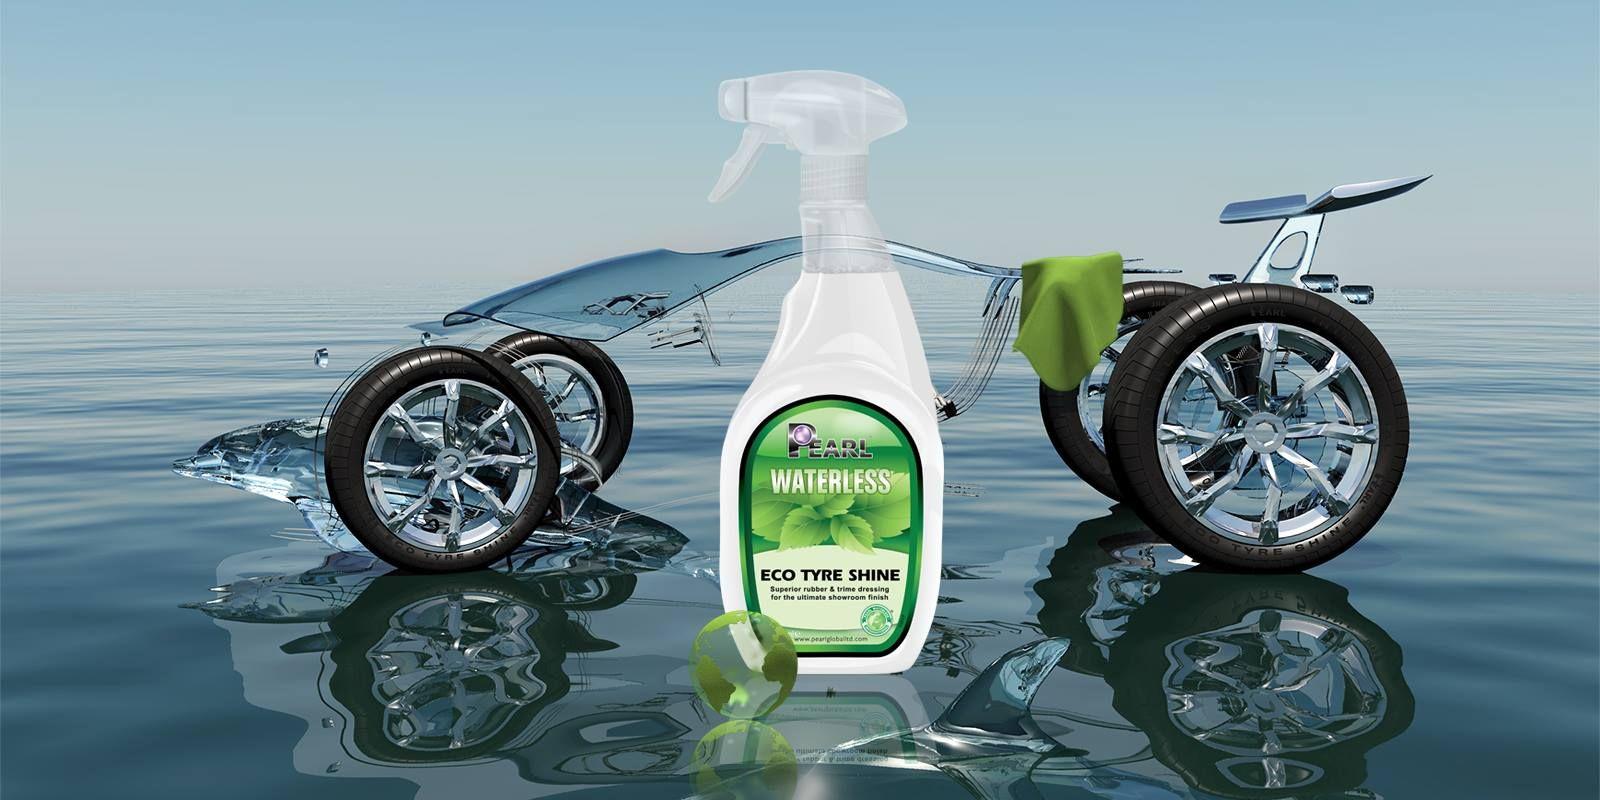 Eco Tyre Shine Tyre shine, Waterless car wash, Car wash